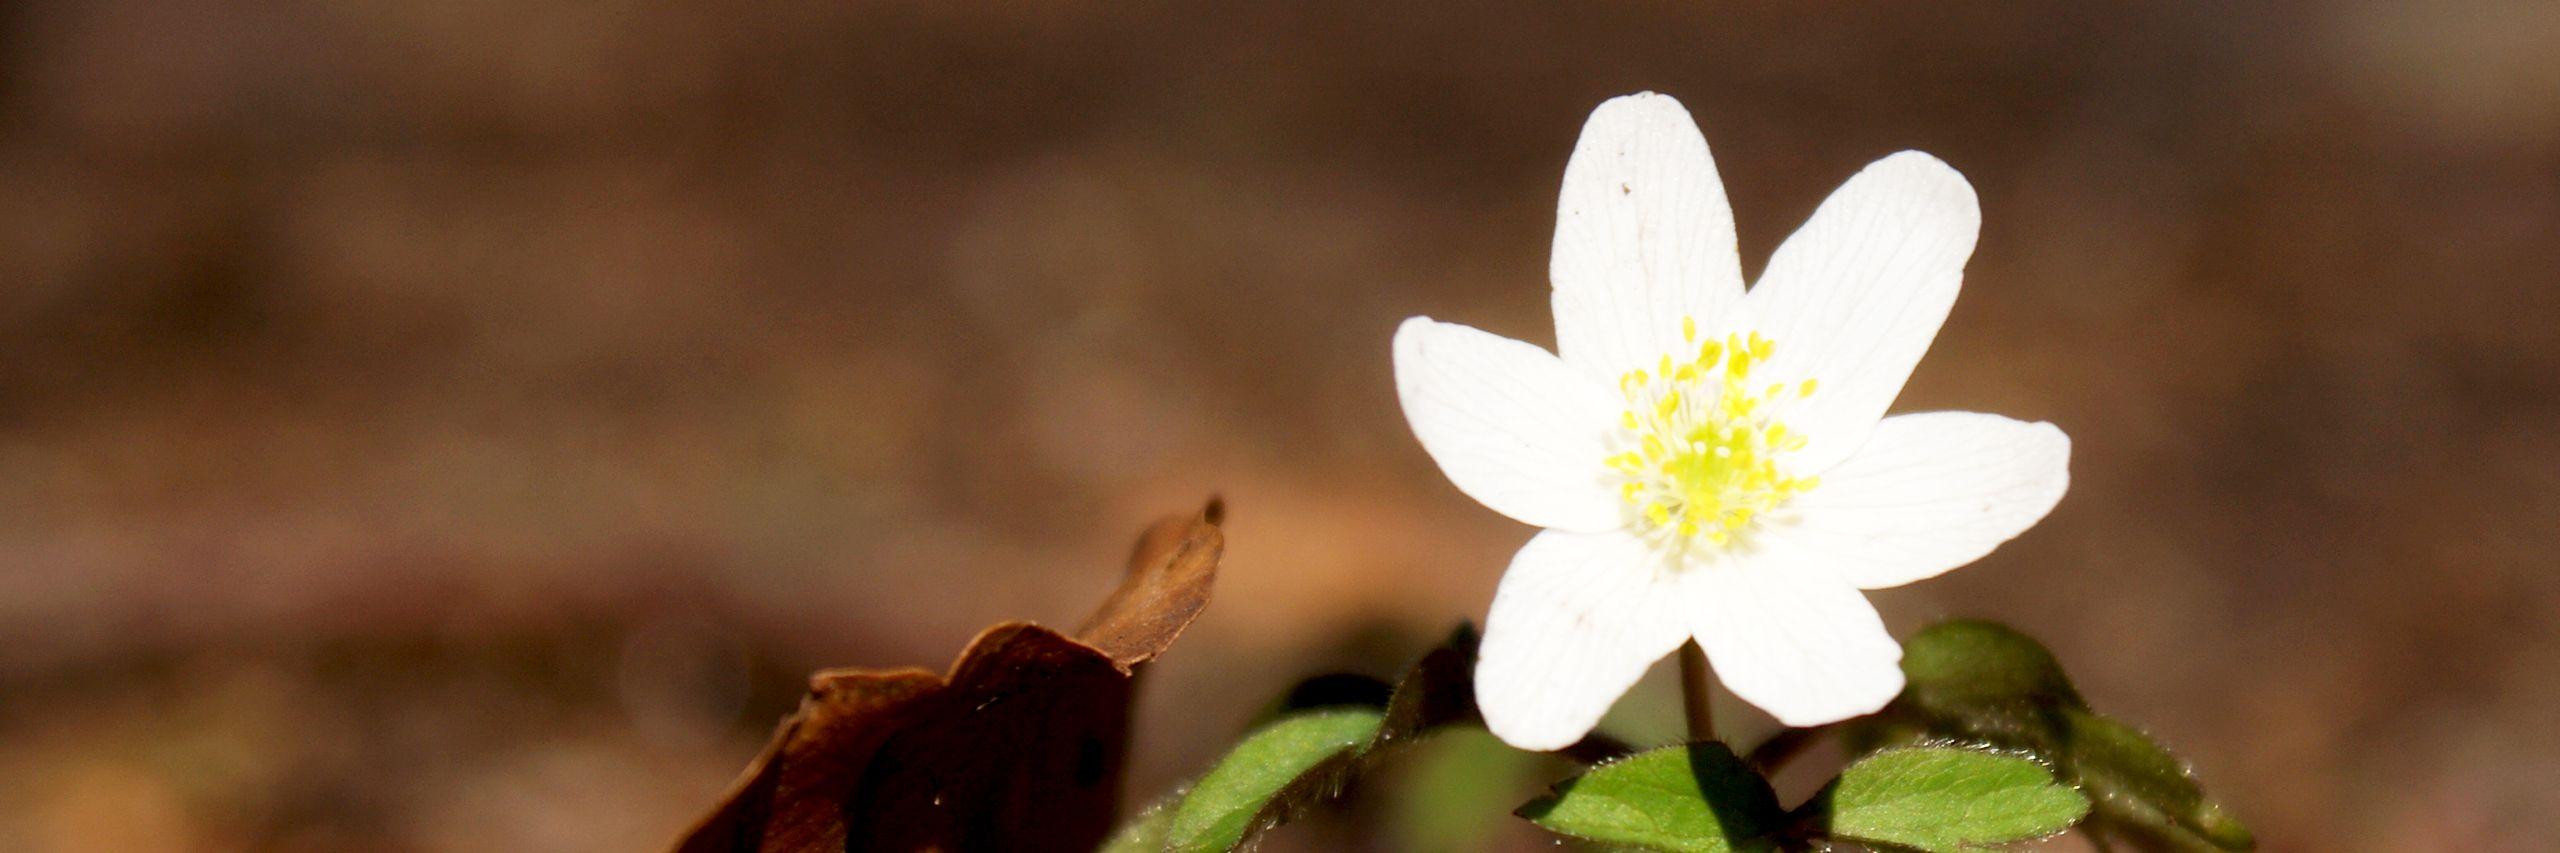 flower_w2560